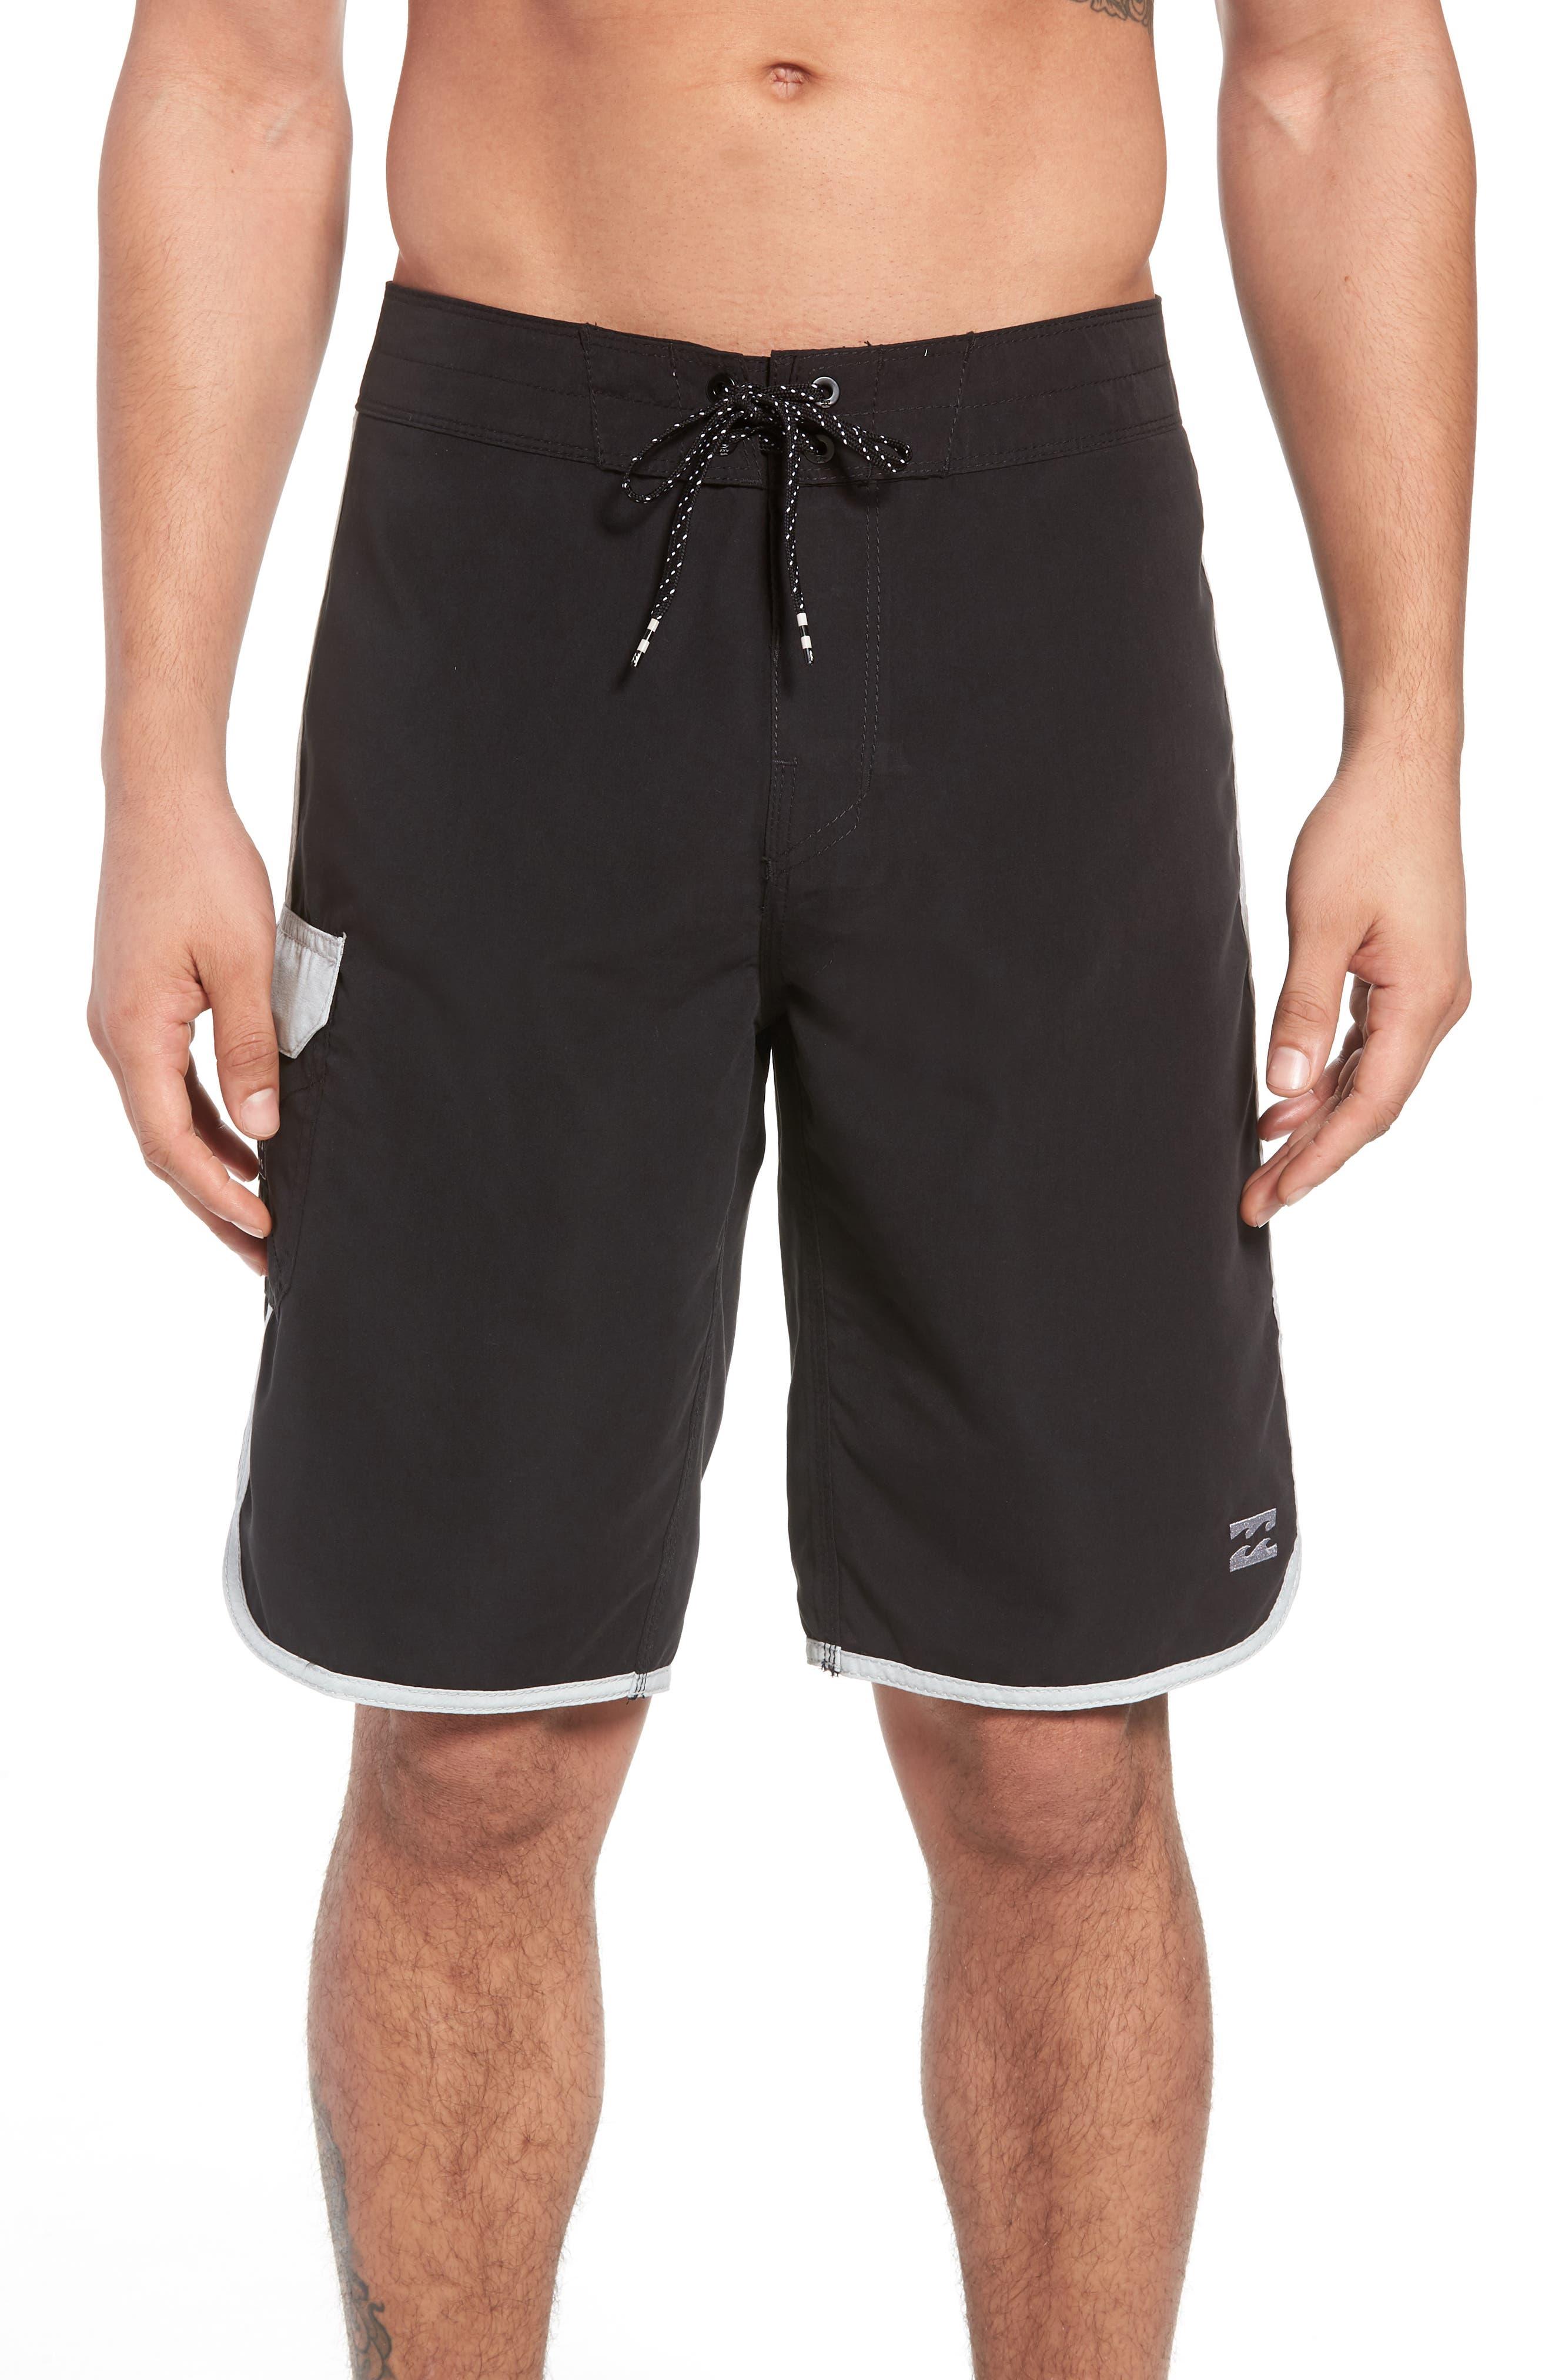 73 OG Board Shorts,                             Main thumbnail 1, color,                             001